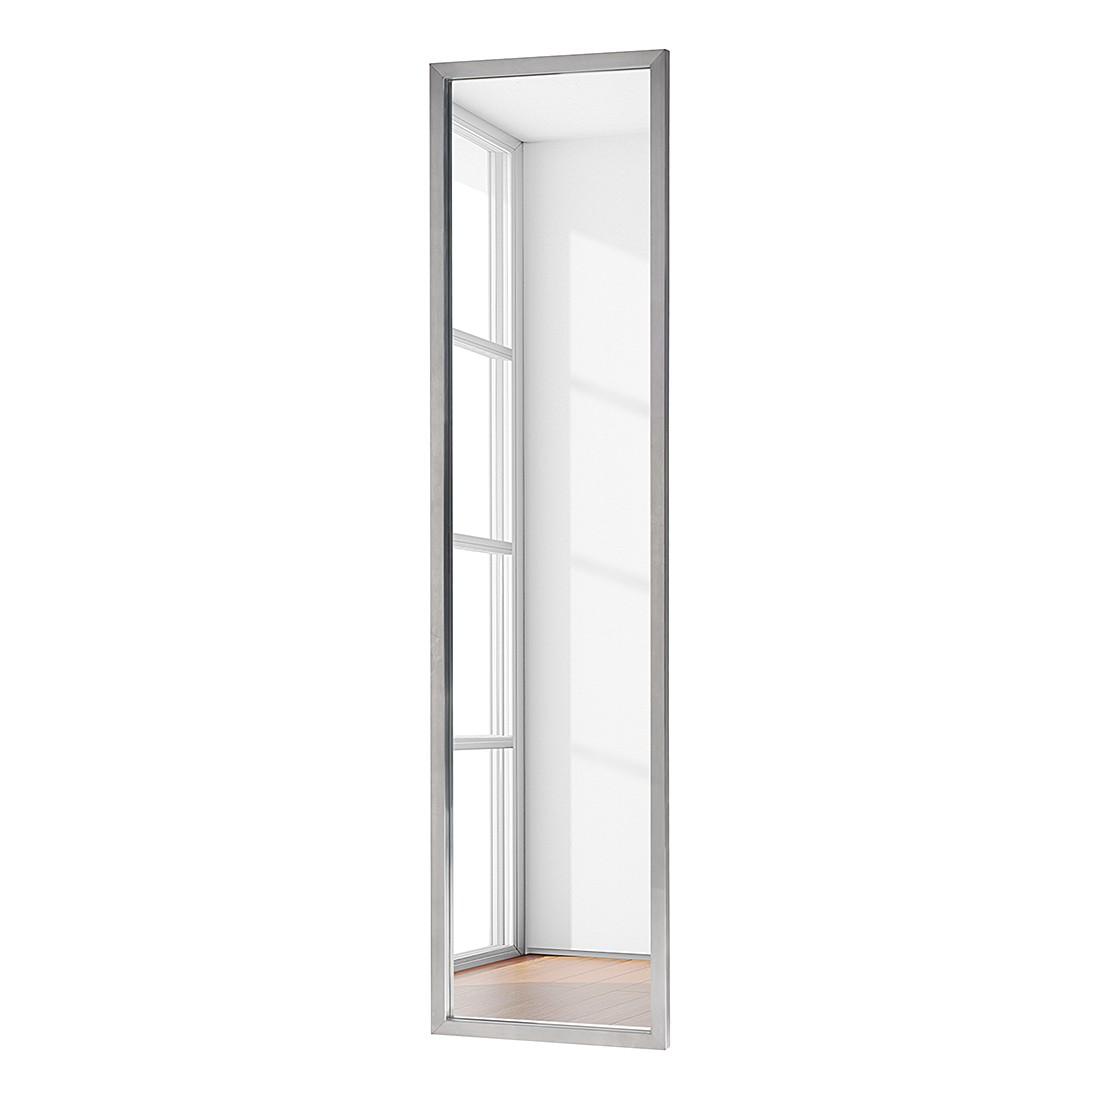 Wandspiegel Siempro – Edelstahl, PureDay bestellen